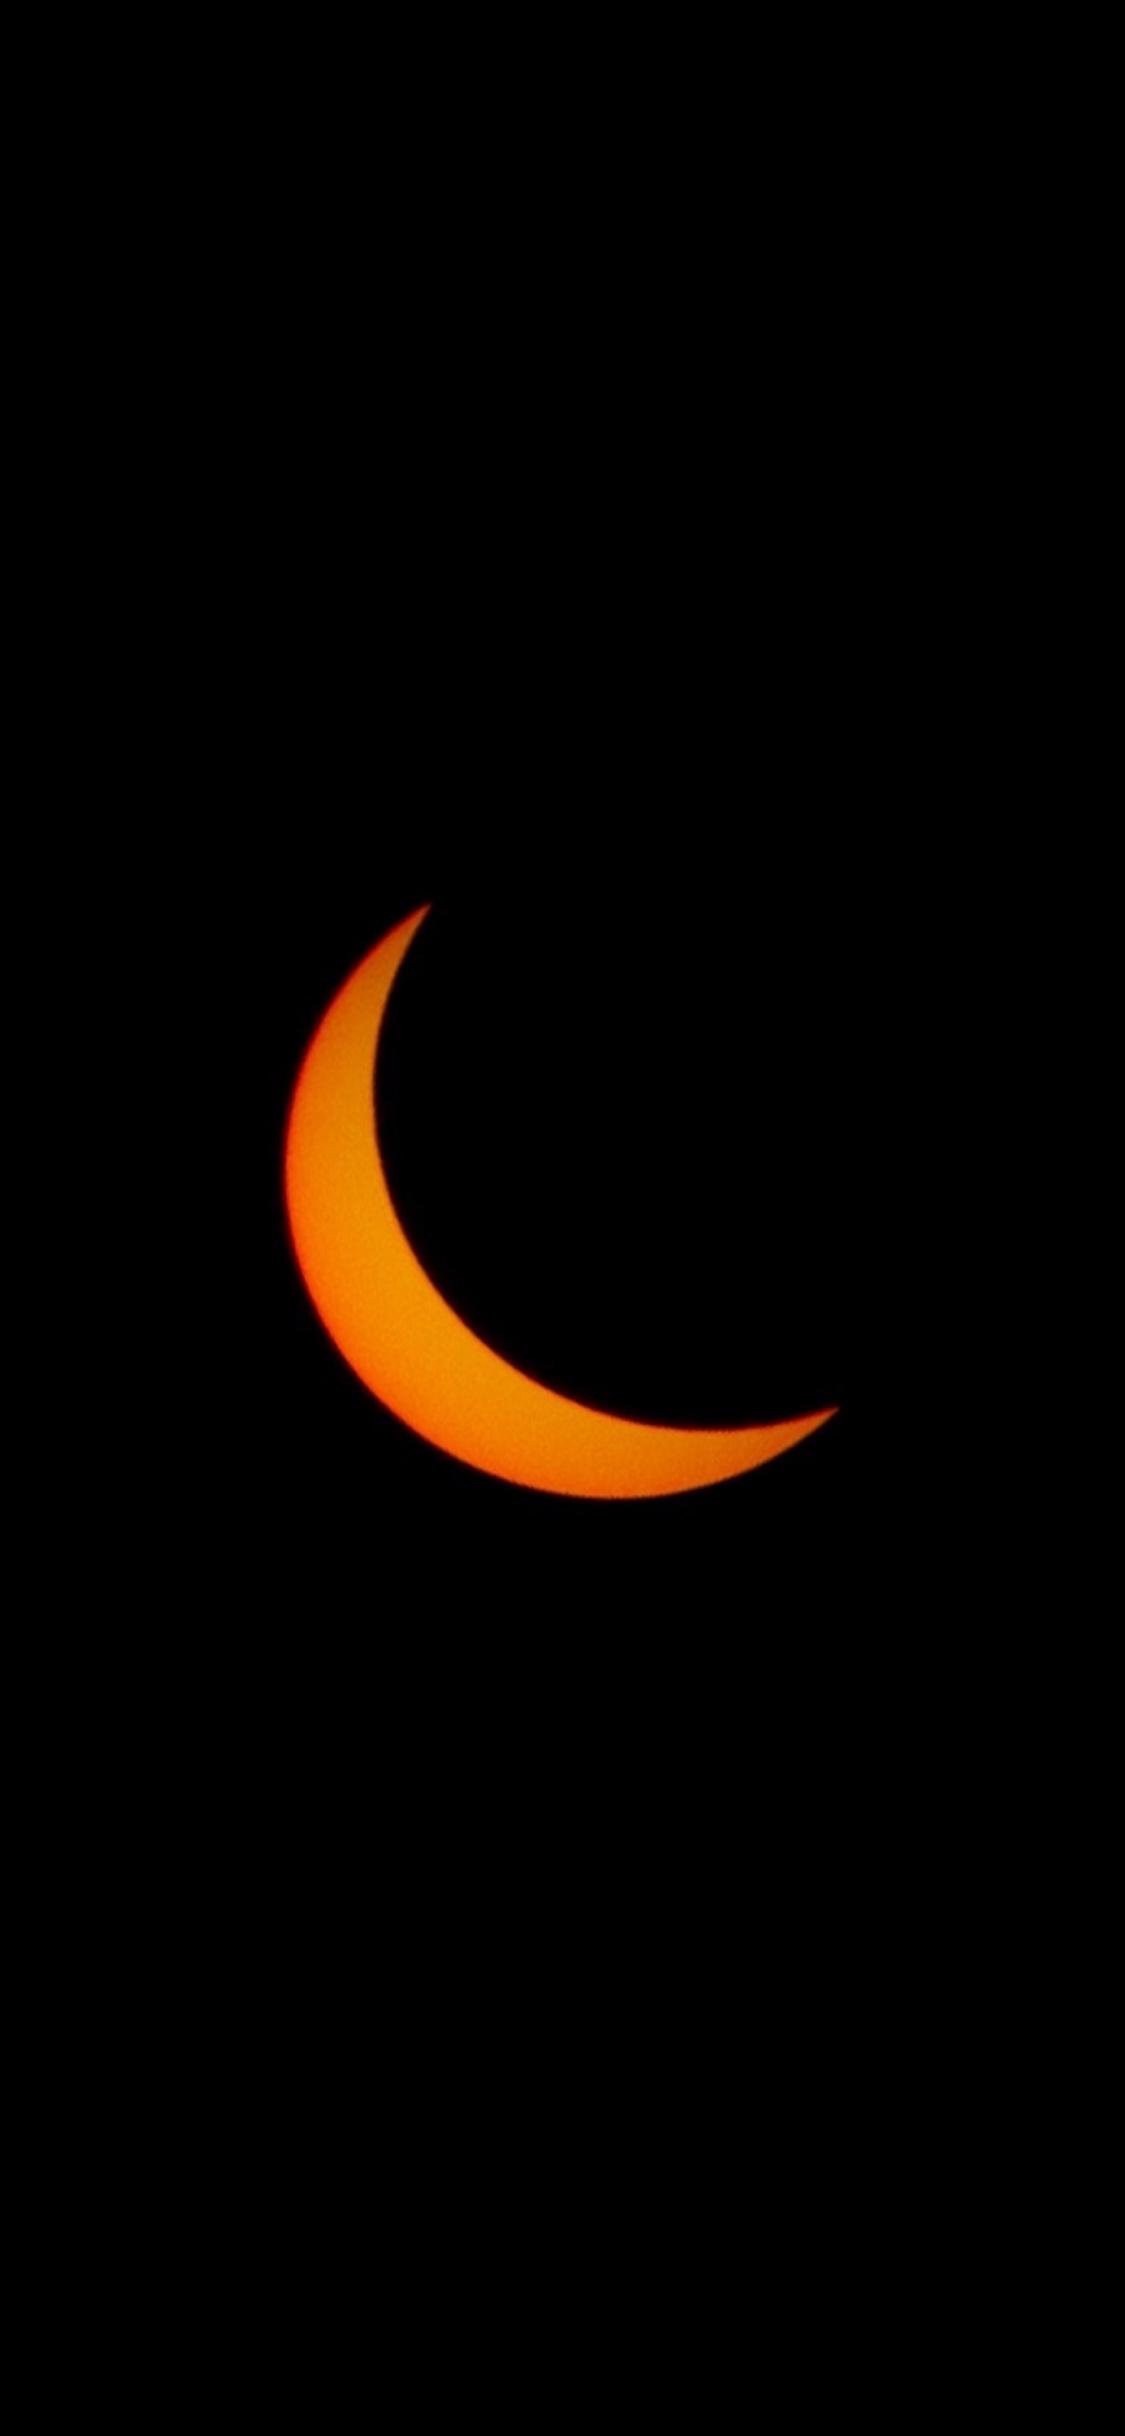 Crescent, Moon, Sky, Minimal, Wallpaper - Мусульманские Обои На Айфон , HD Wallpaper & Backgrounds